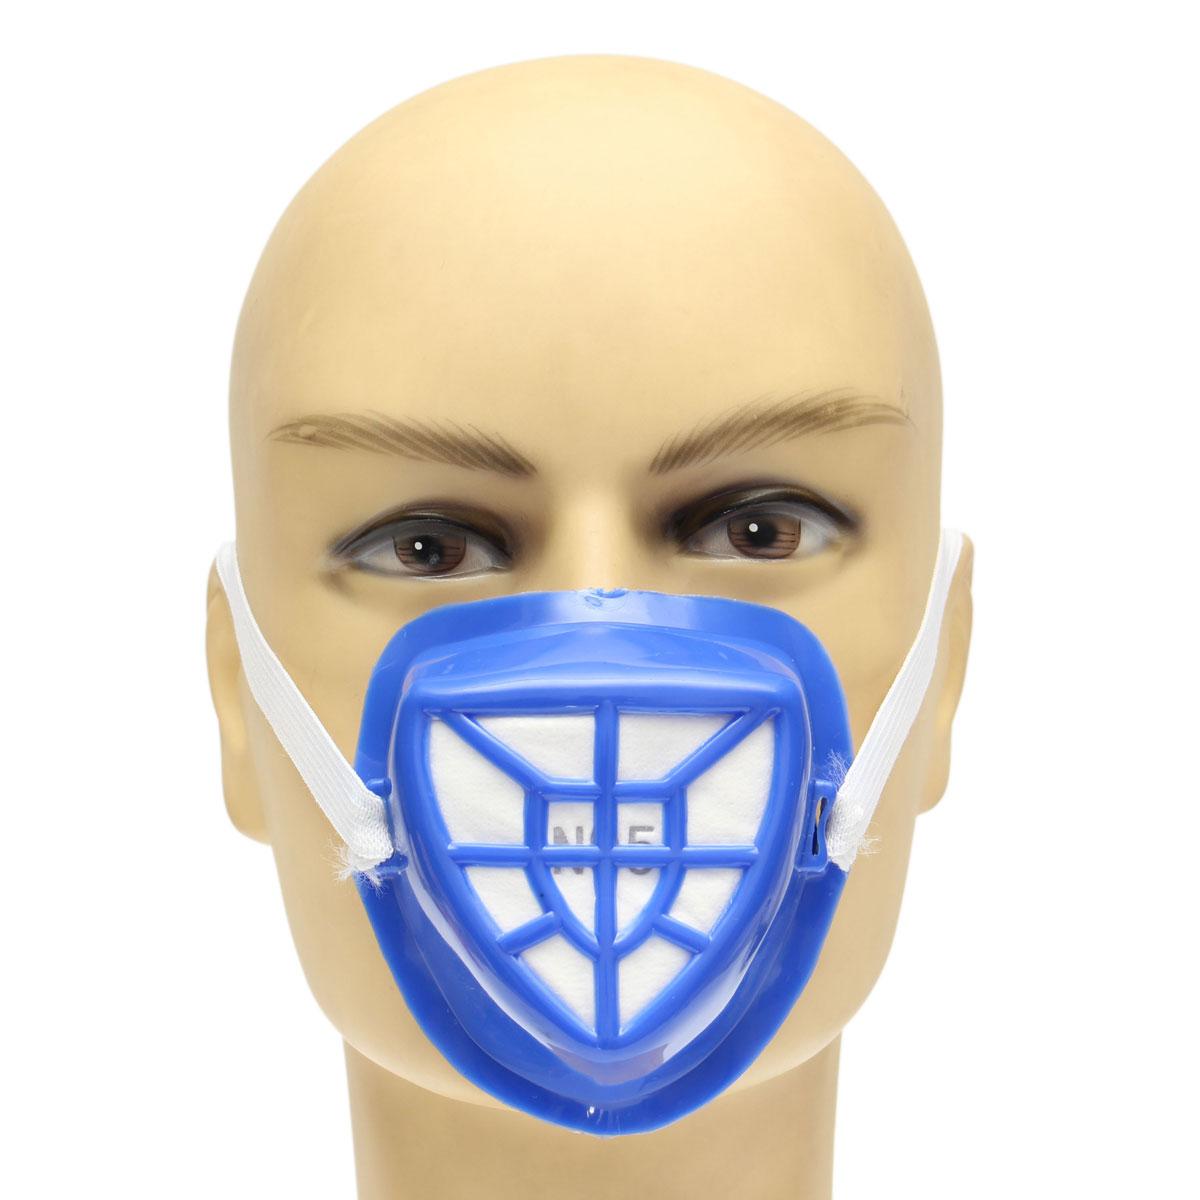 Anti-Dust Respirator for Welder Welding Paint Spraying Cartridge Gas Mask Filter